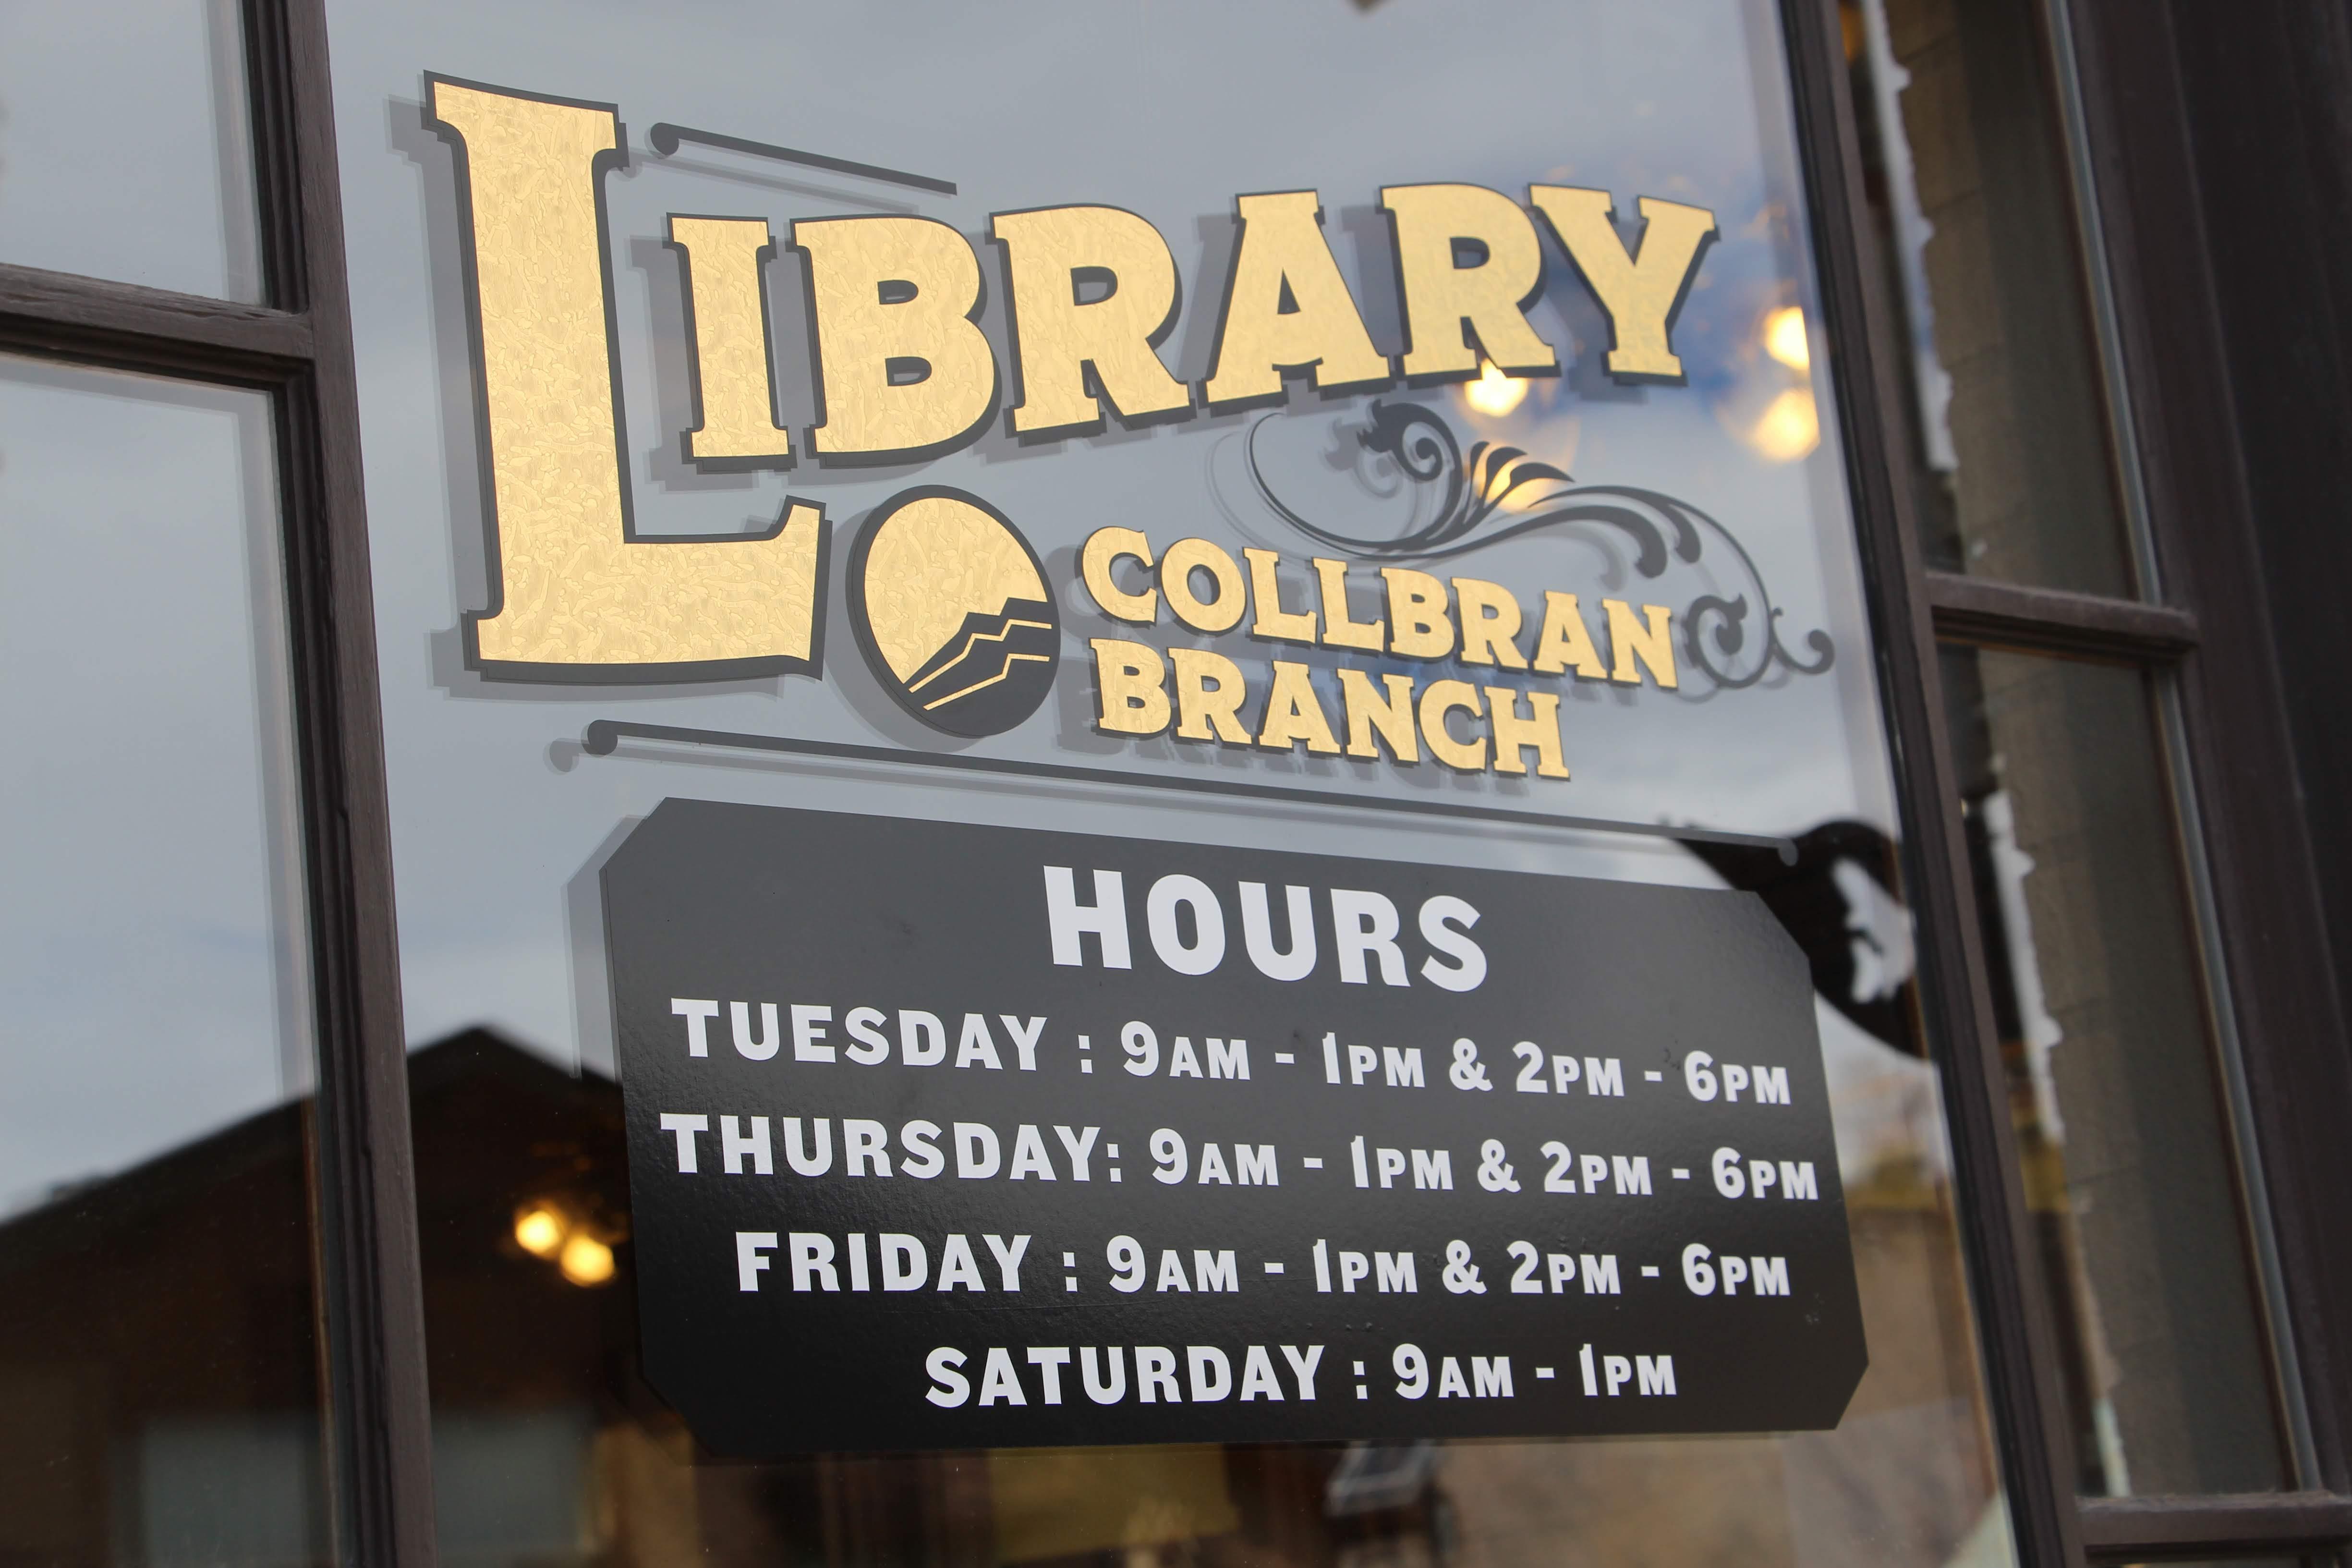 Collbran sign detail